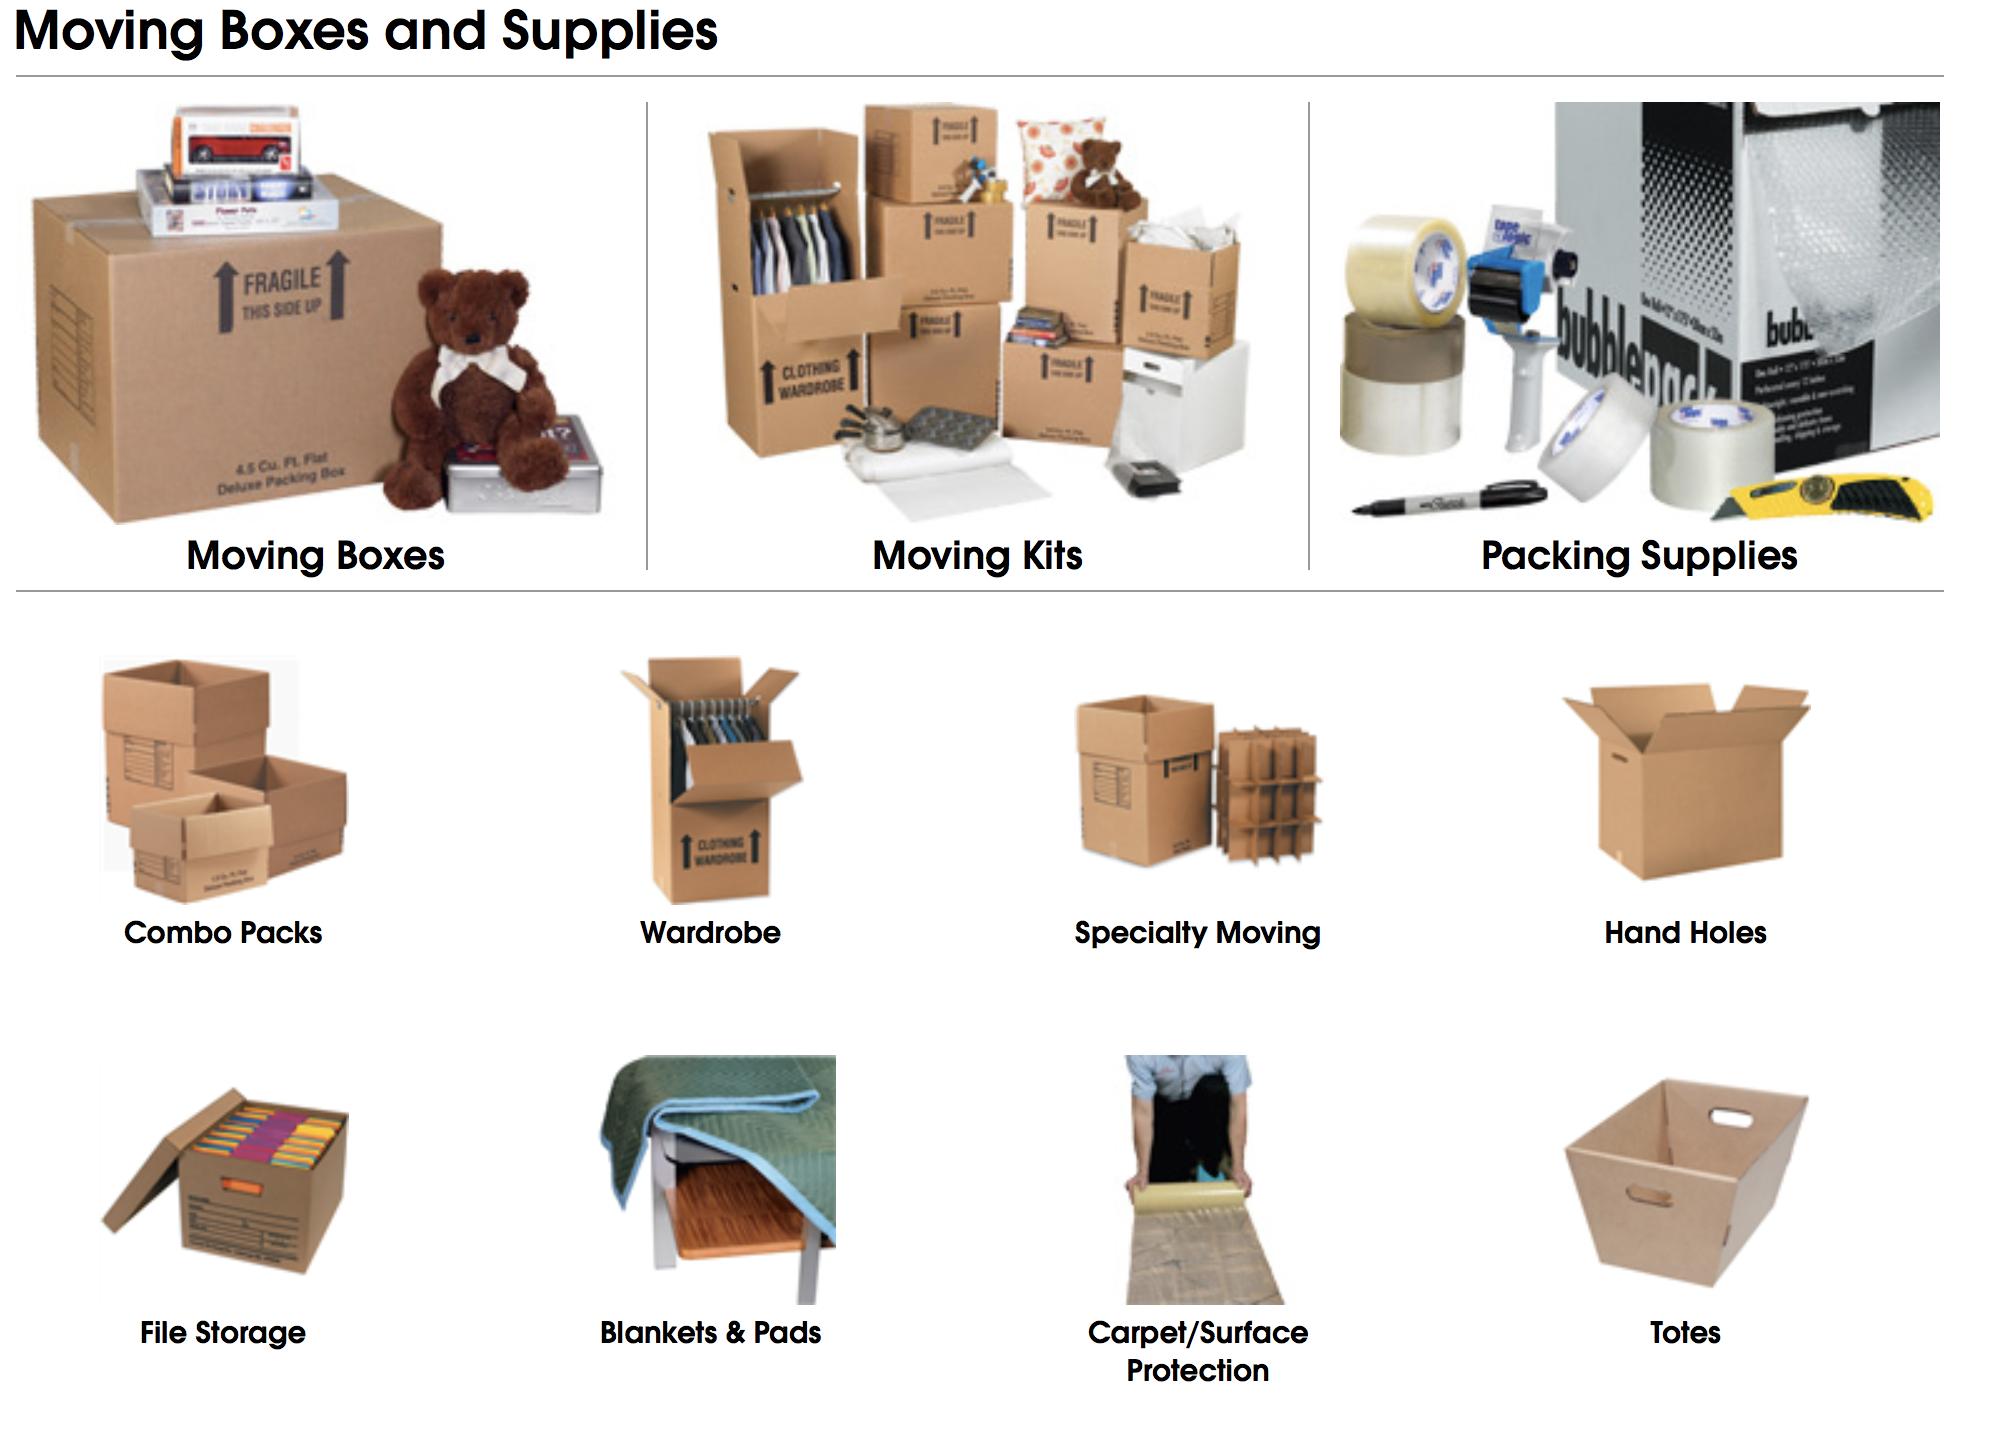 Moving boxes wardrobe box dish packs storage